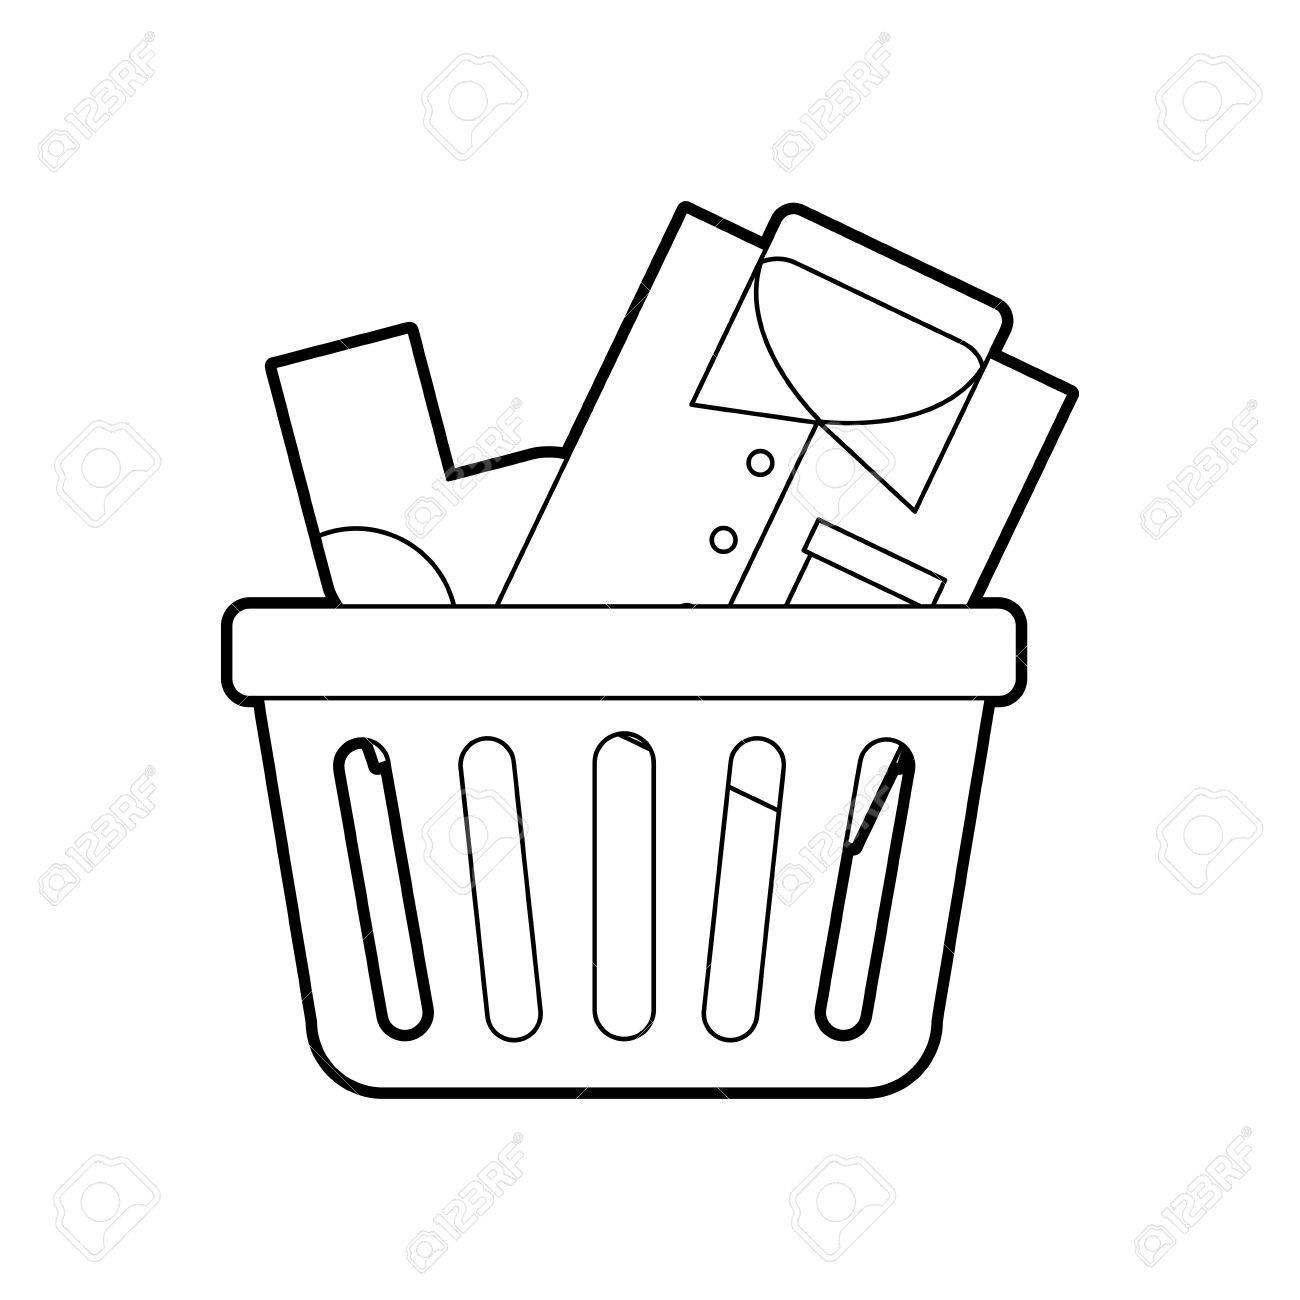 Laundry Basket Drawing At Getdrawings